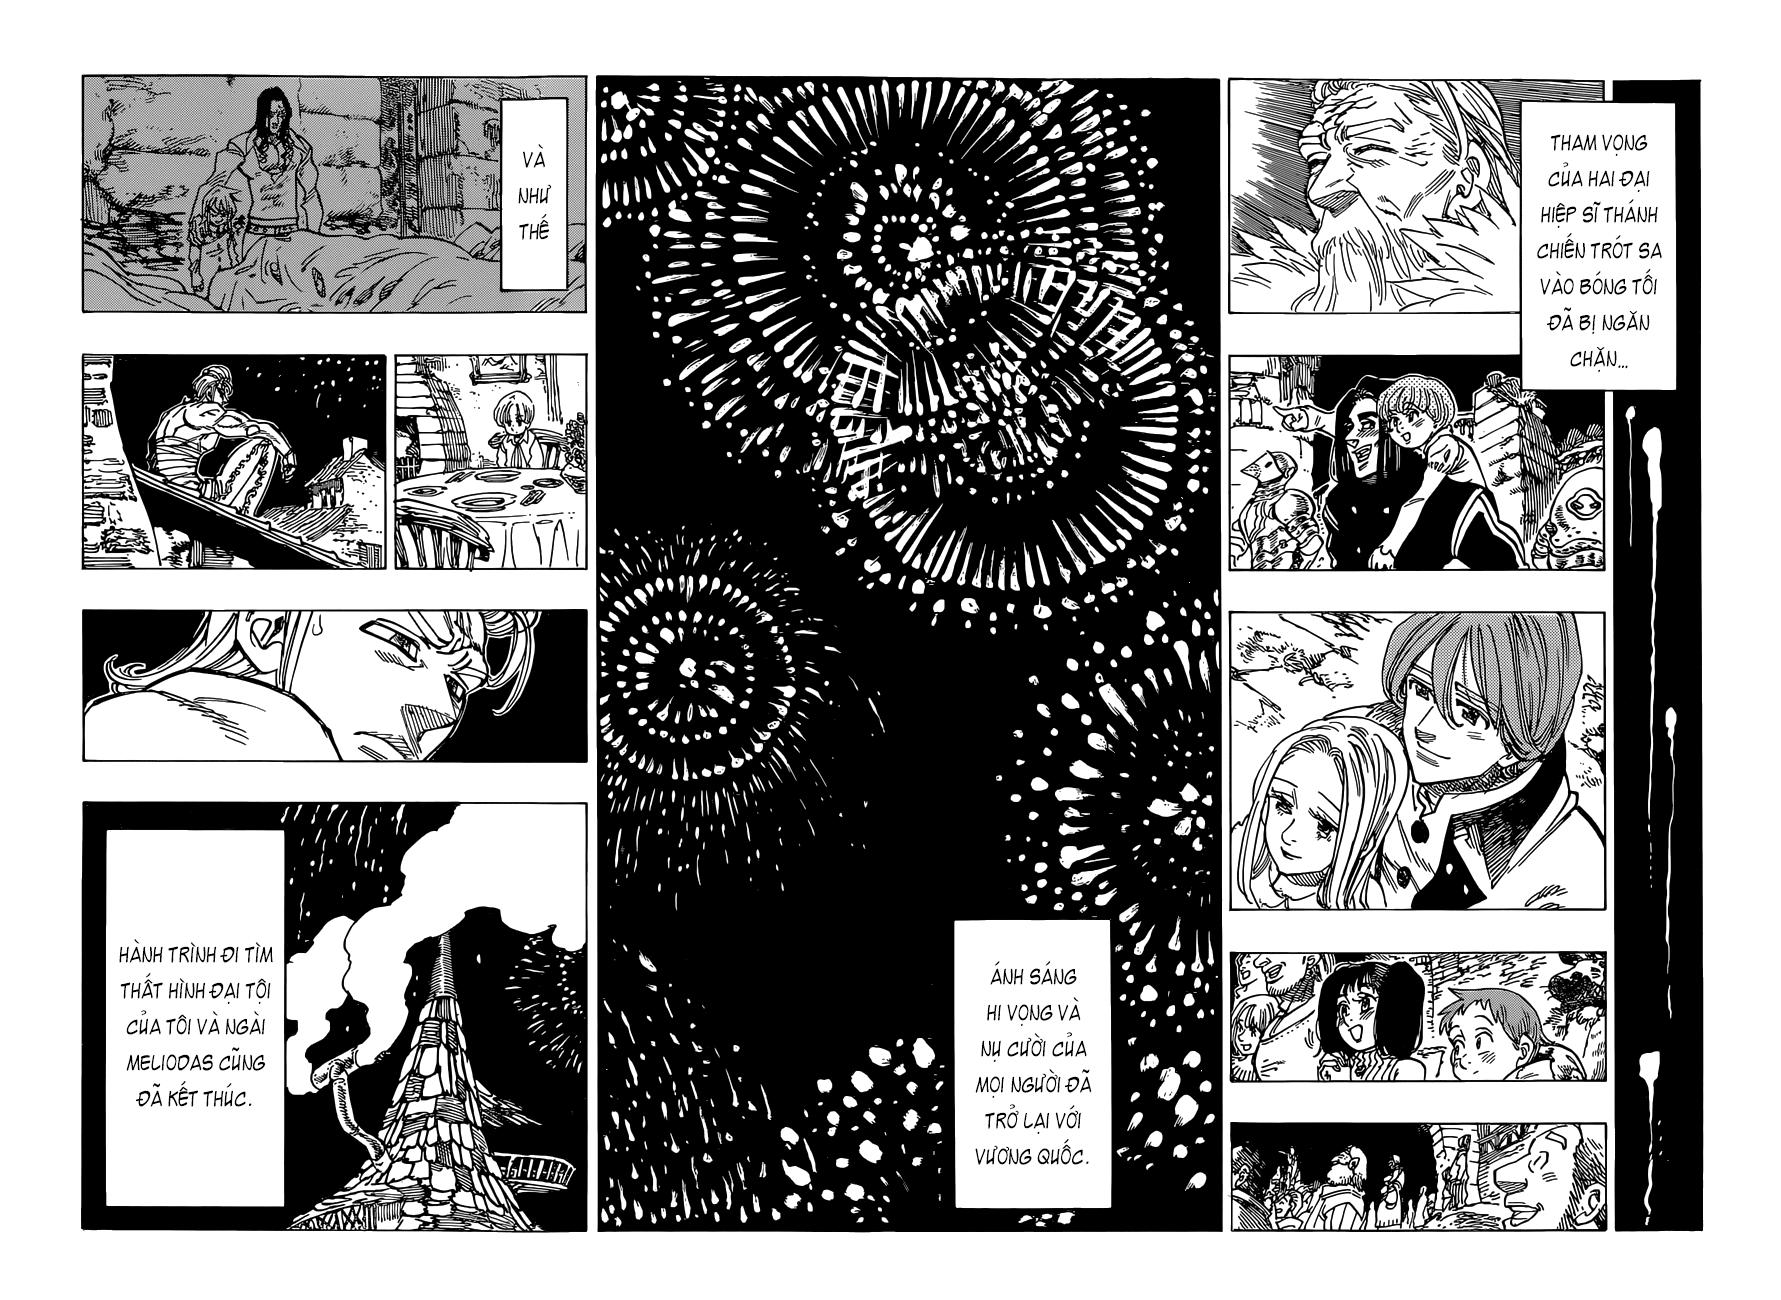 Nanatsu no Taizai - Thất Hình Đại Tội chap 103 page 9 - IZTruyenTranh.com